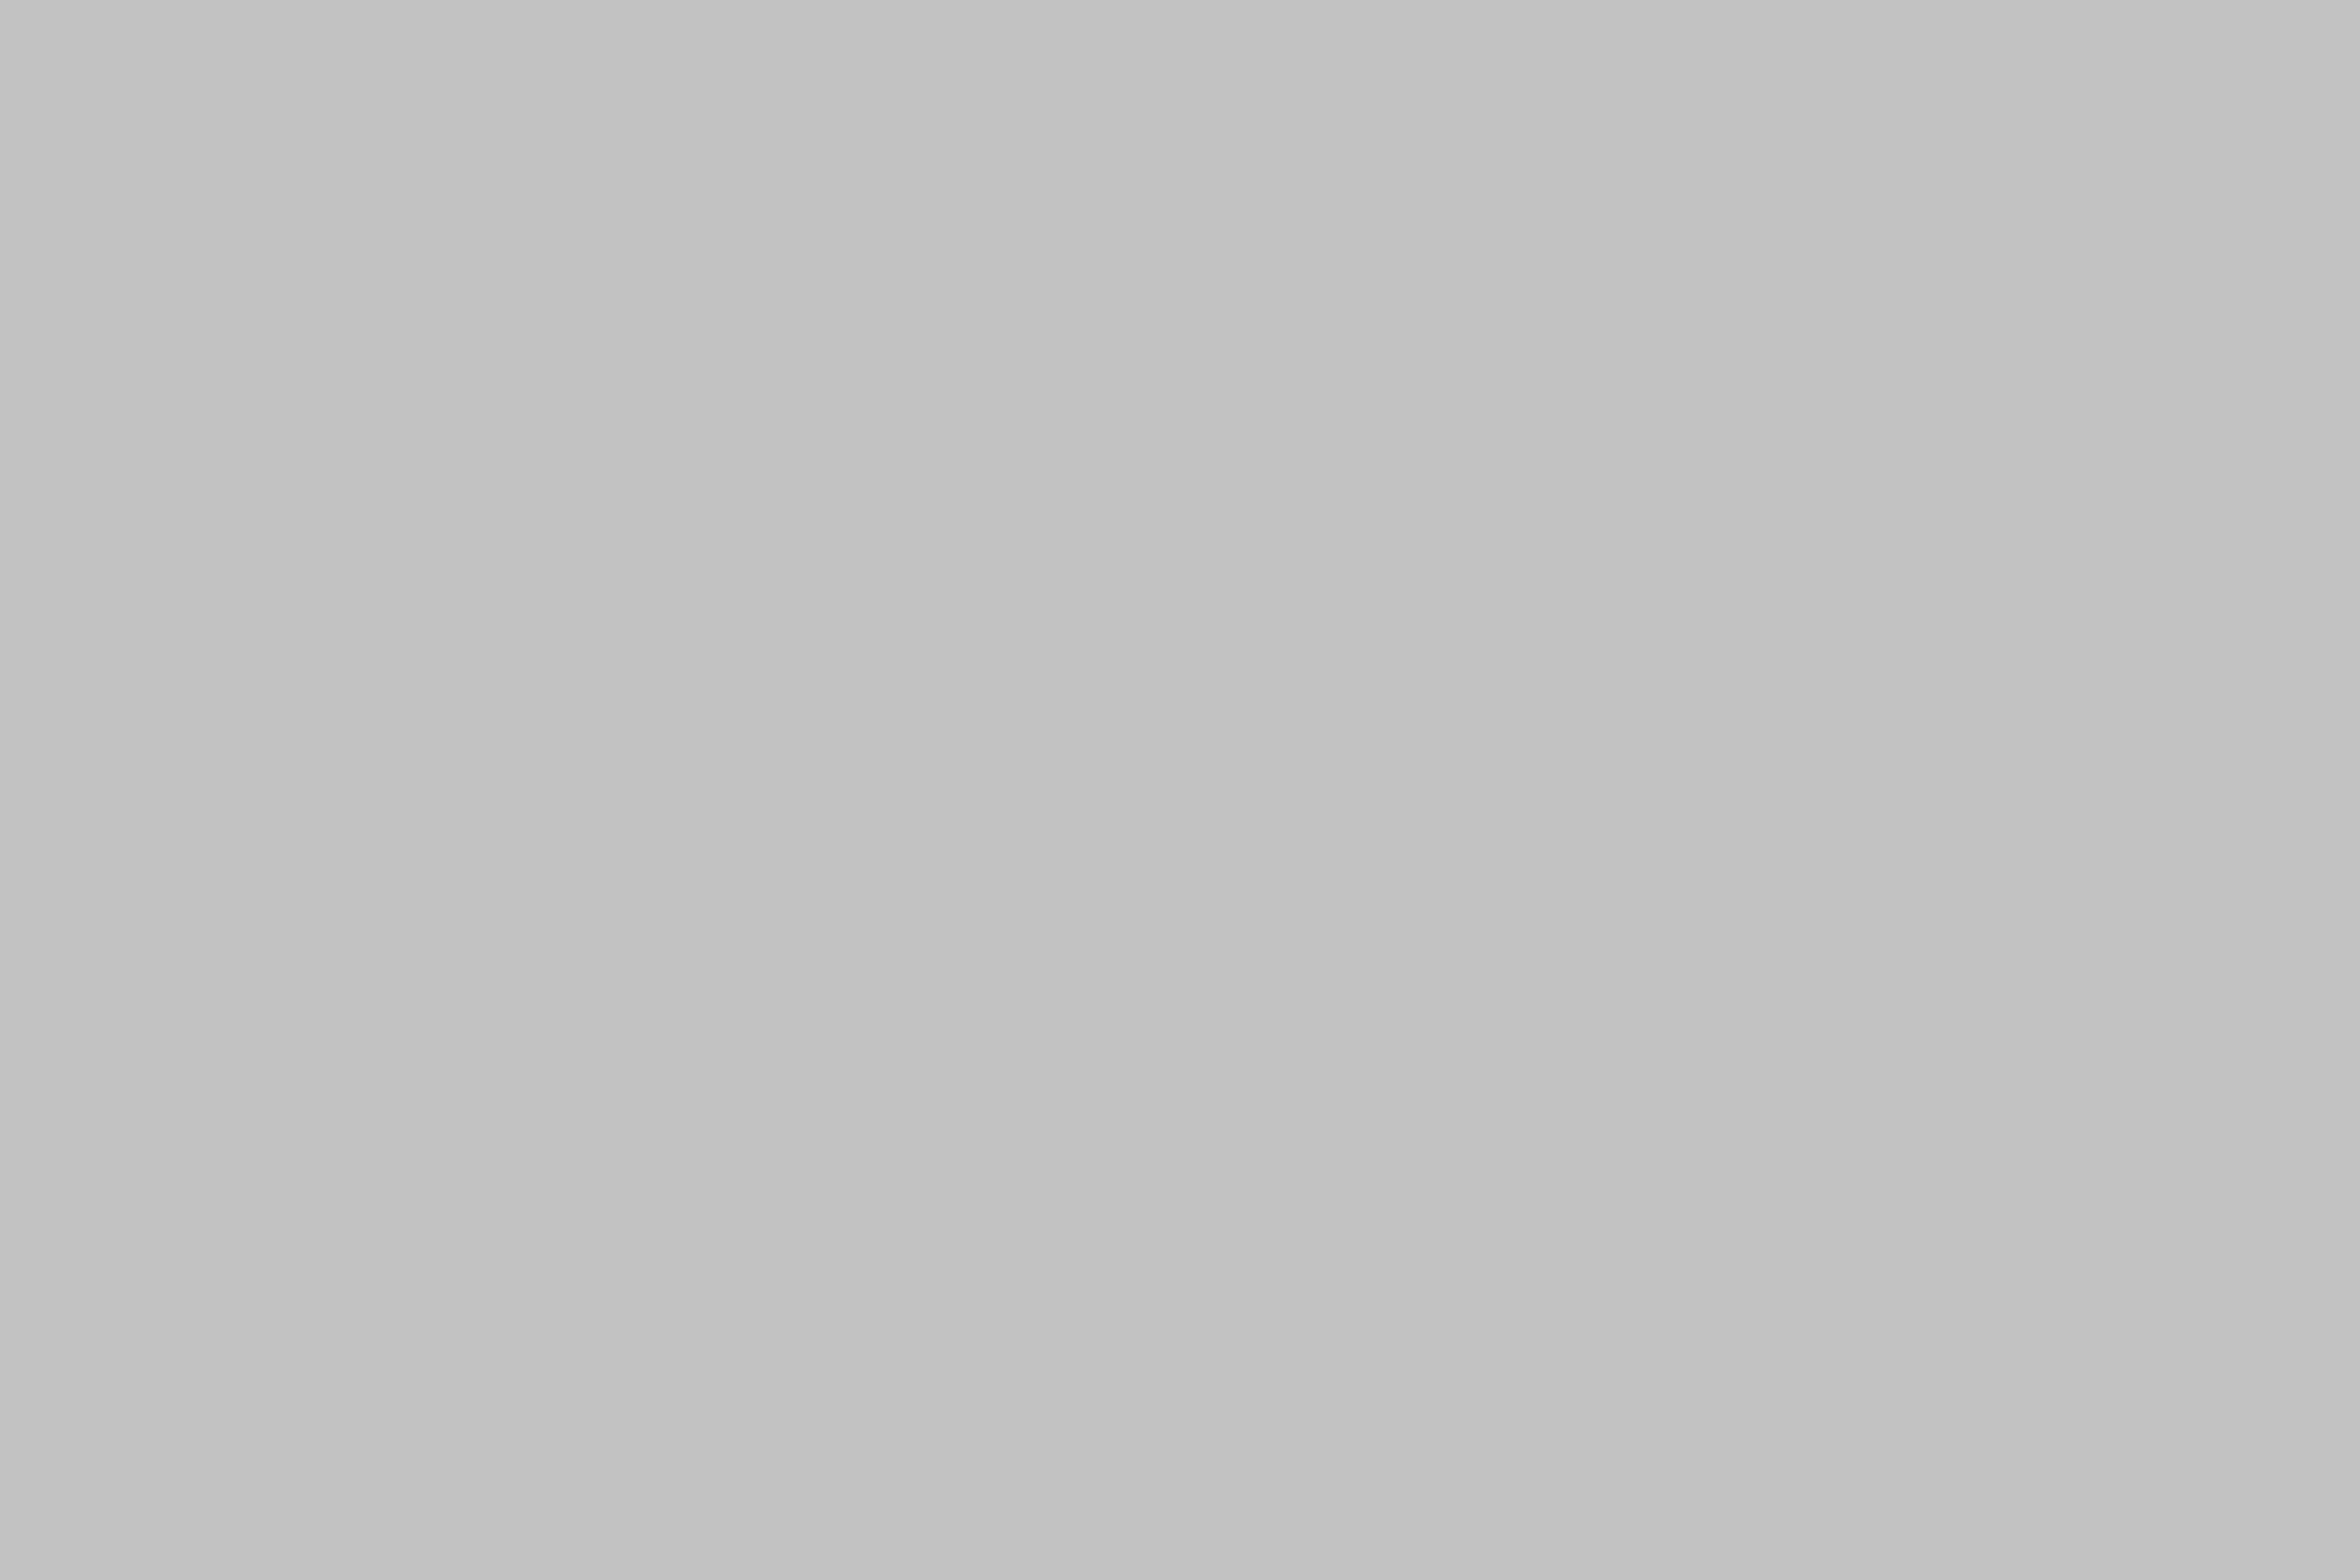 SquareSpace-SermonSeries copy 5.jpg